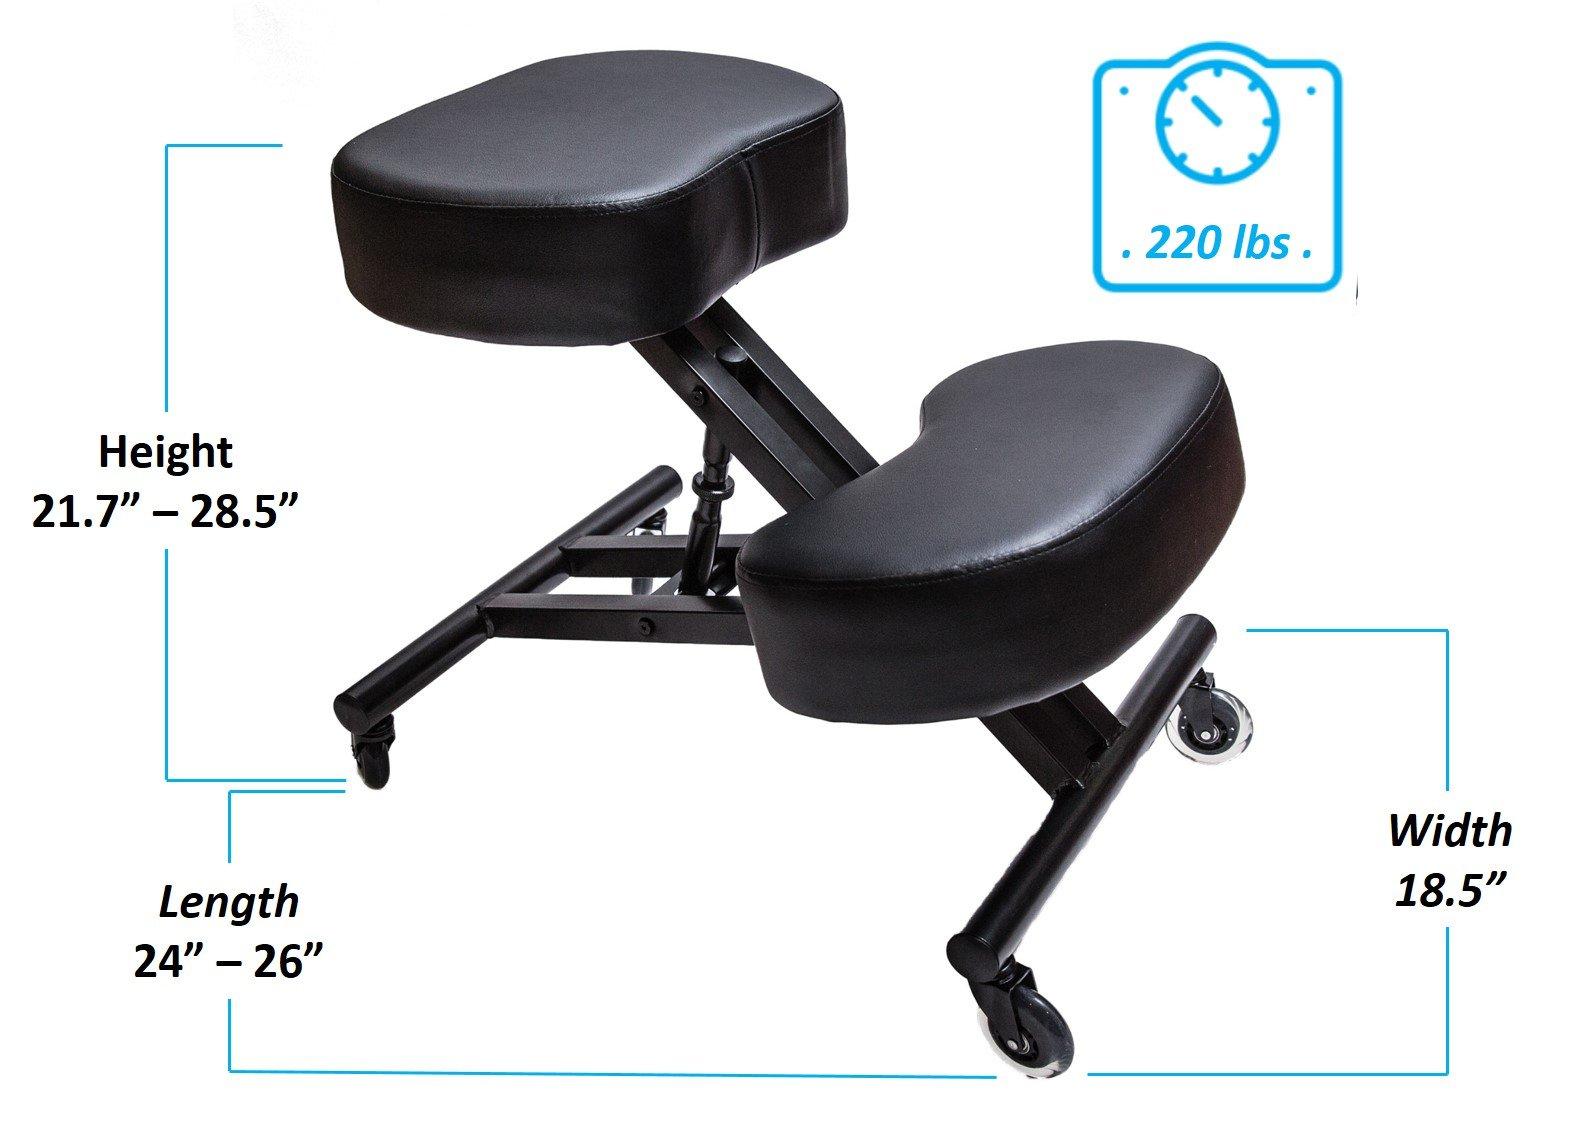 Sleekform Ergonomic Kneeling Chair M2 (Memory/Regular Foam), Adjustable Stool for Home, Office, and Meditation by Sleekform (Image #6)